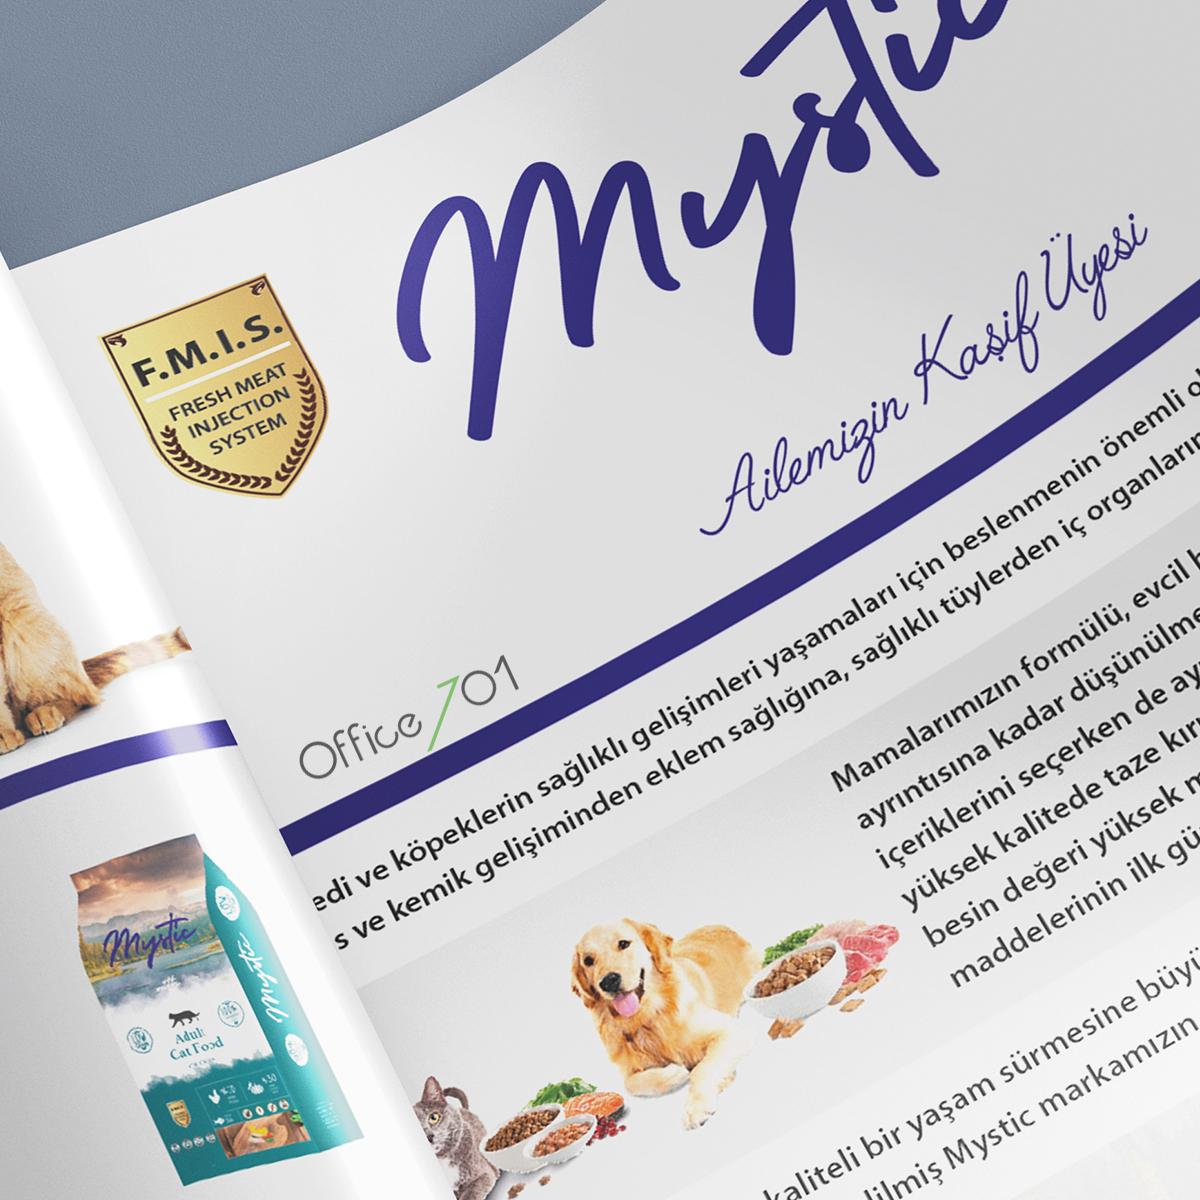 Office701 | Hermos | Catalog Design